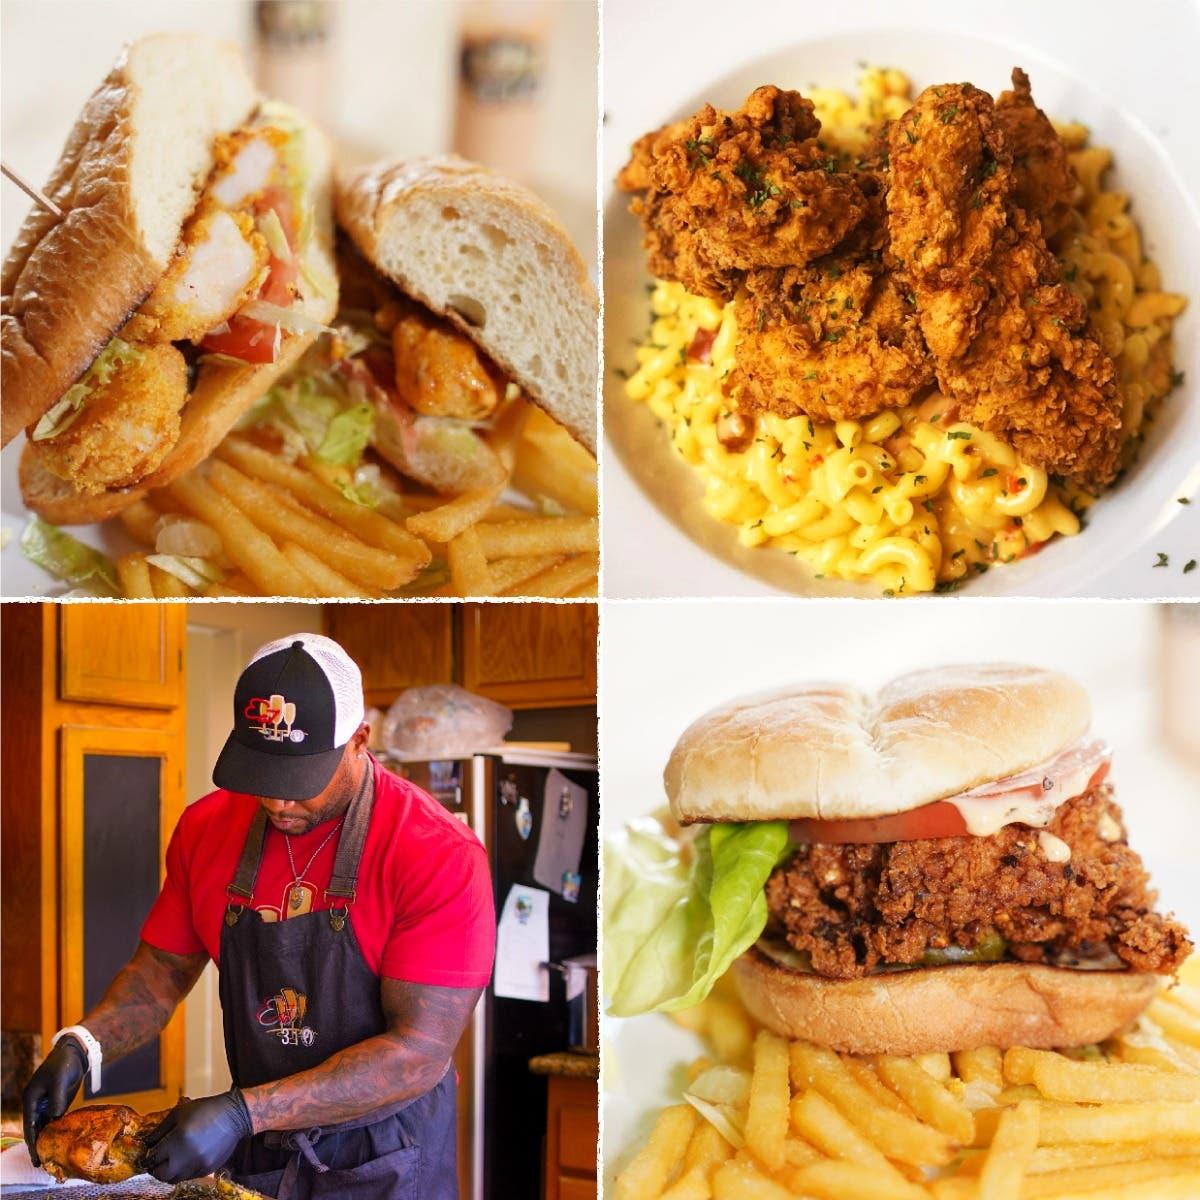 Local Event: Cajun Food Pop-Up | Friday in Menifee!